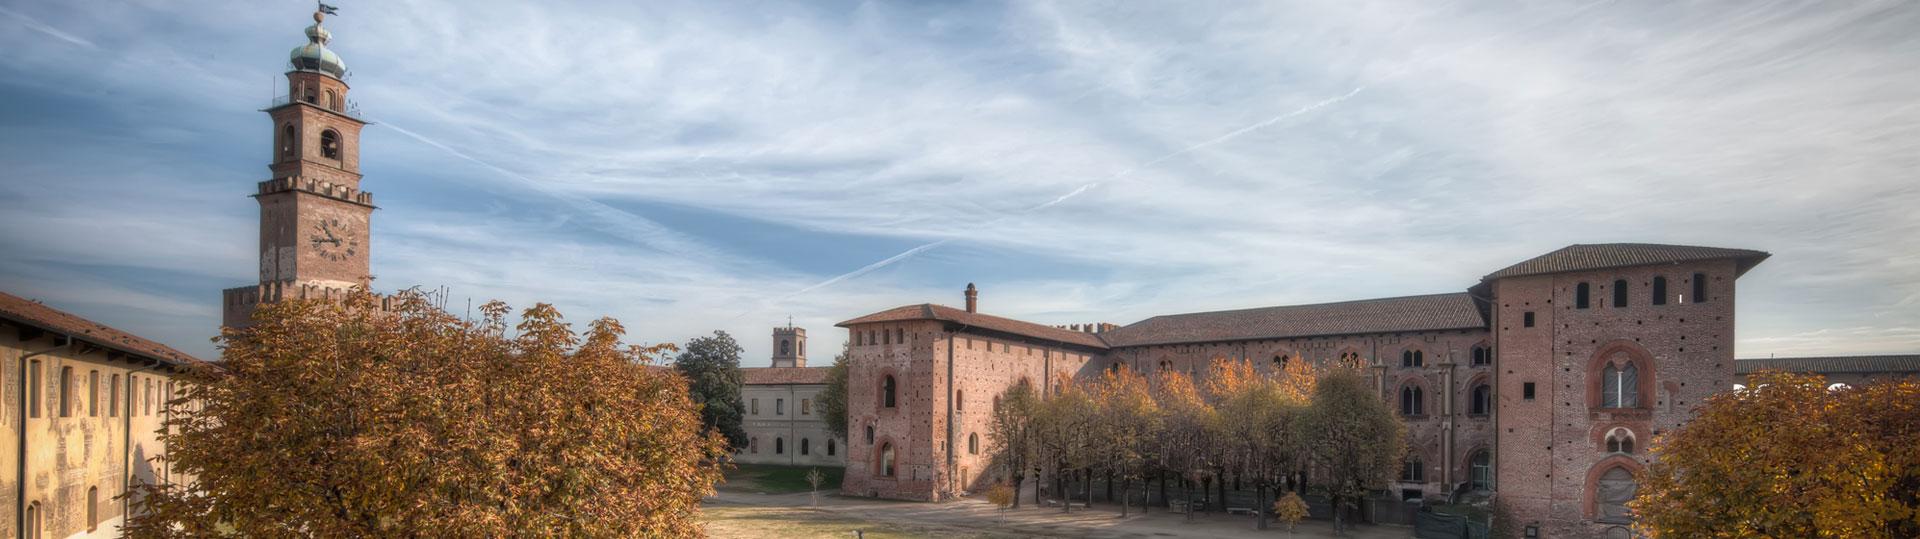 castello-vigevano